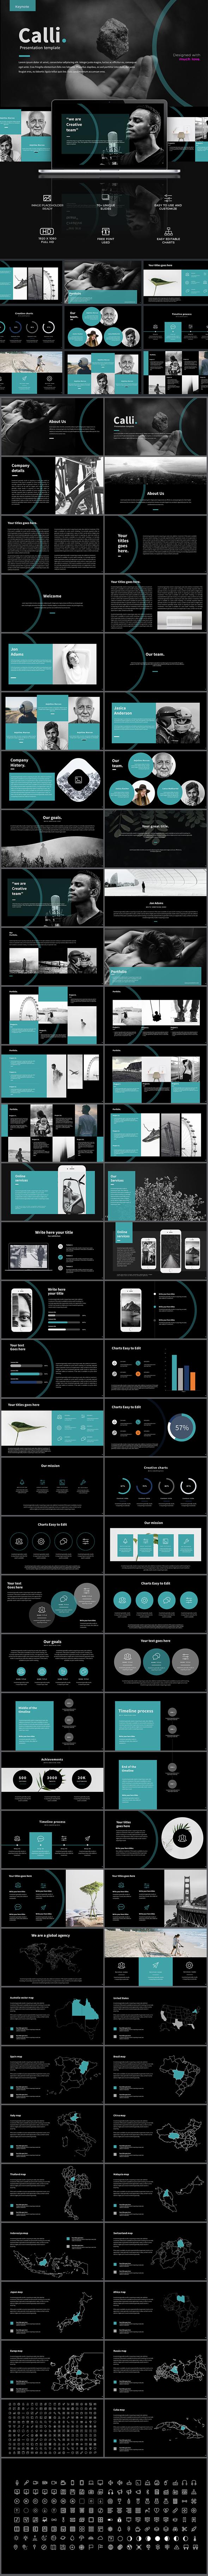 Calli  Keynote Template - Keynote Templates Presentation Templates